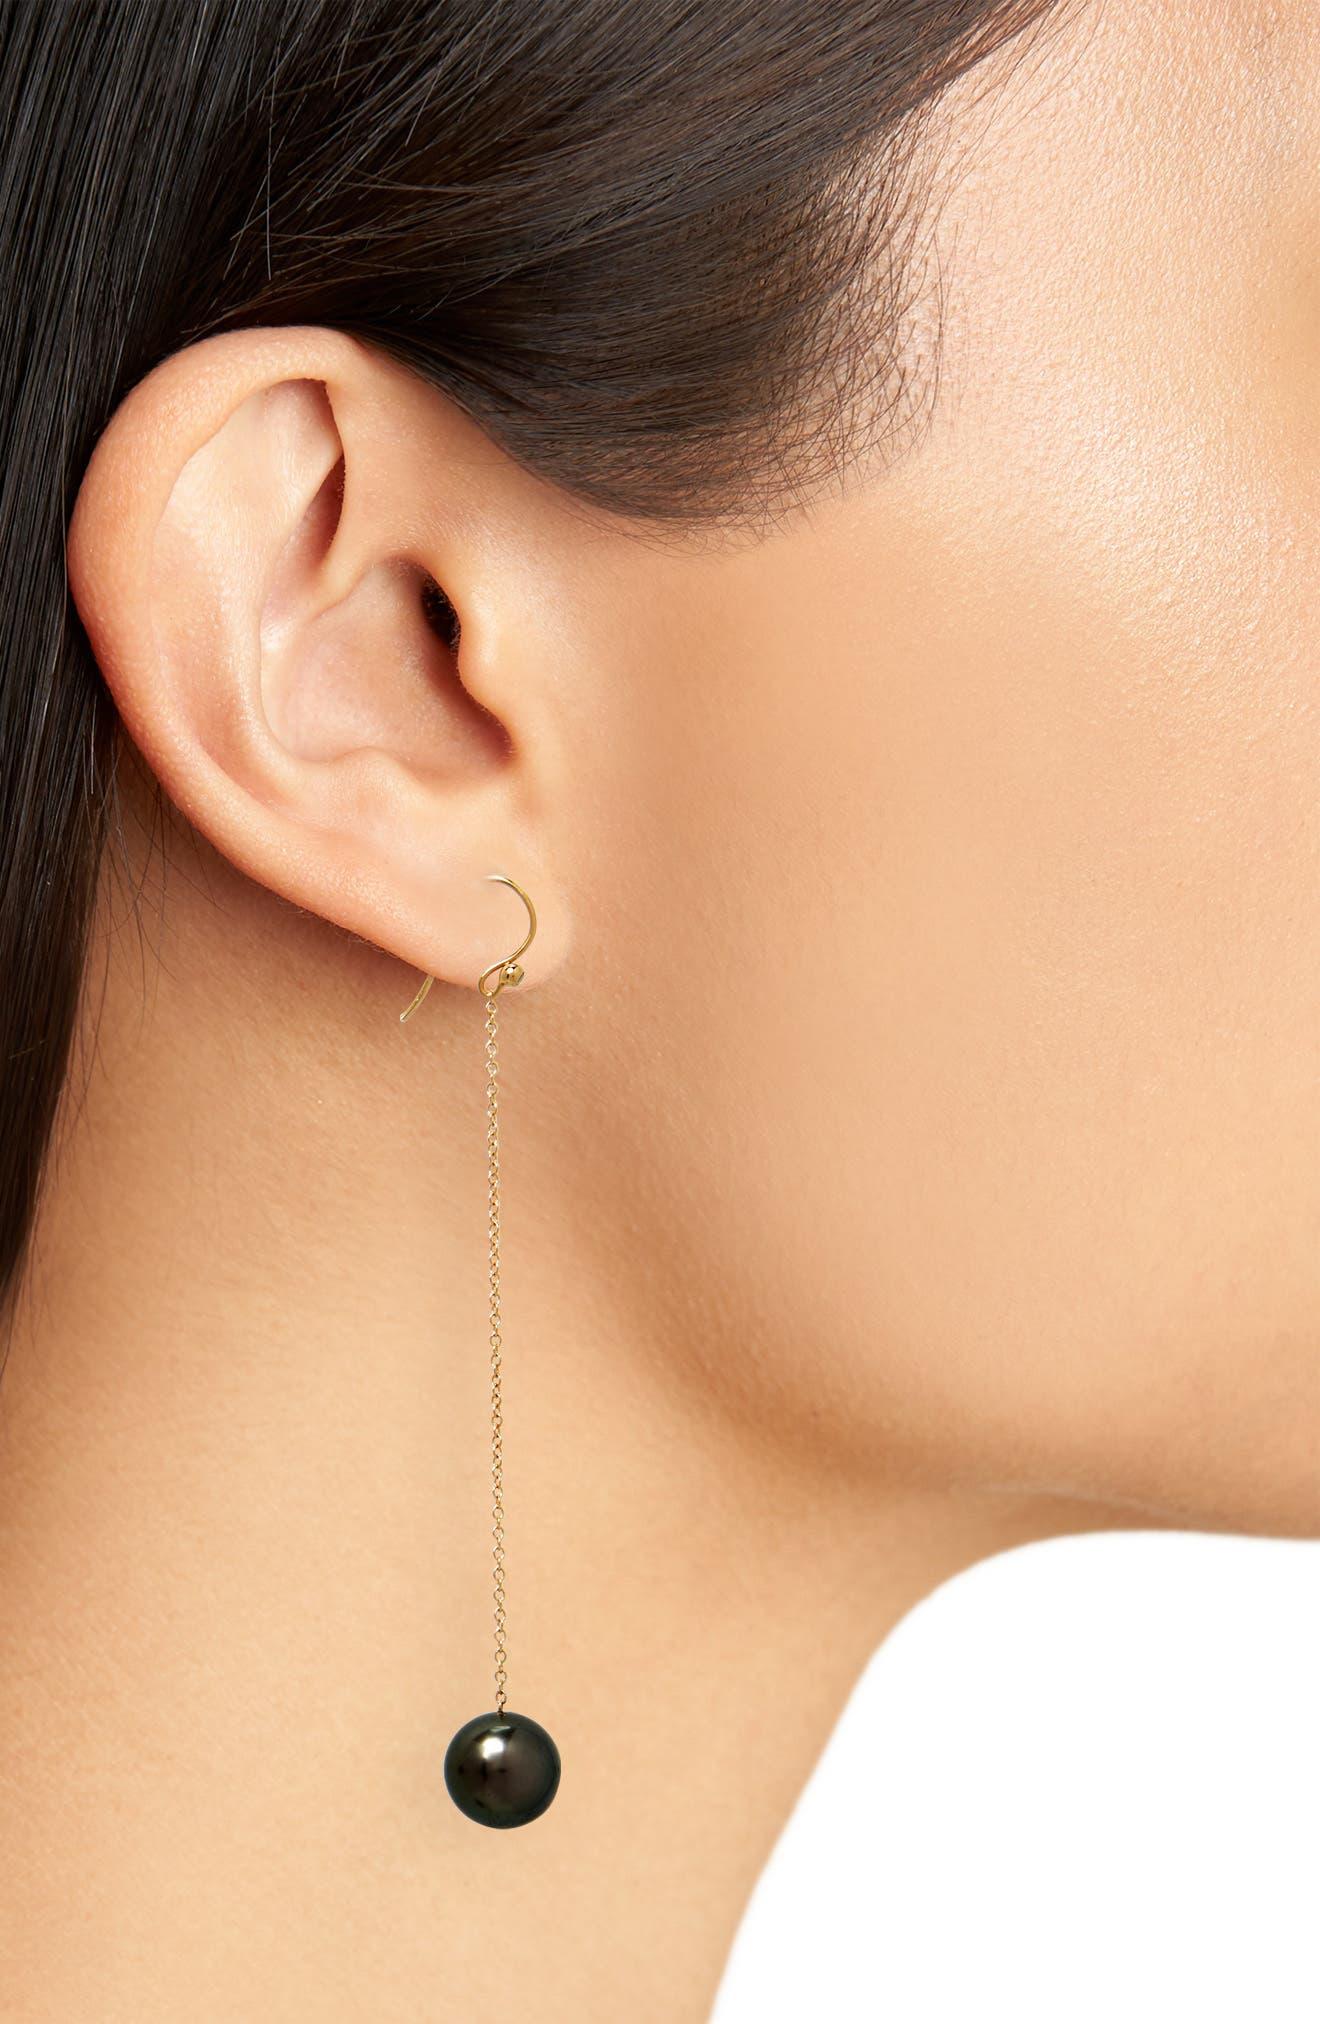 Tahitian Pearl Chain Drop Earrings,                             Alternate thumbnail 2, color,                             Yellow Gold/ Black Pearl